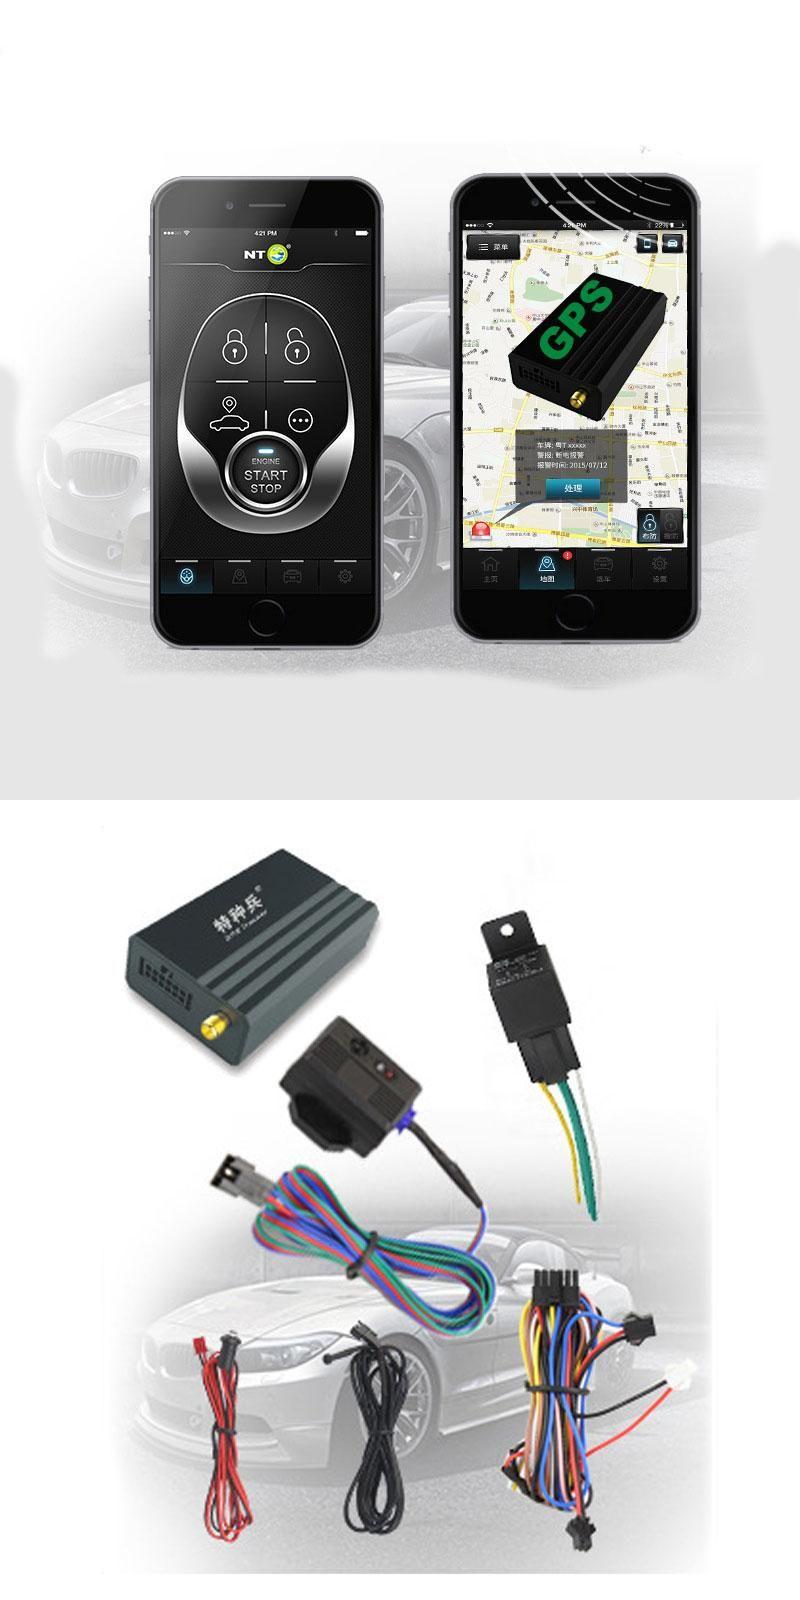 ENKLOV Mobile Phone APP GPS Tracker Car GSM / GPS Locator